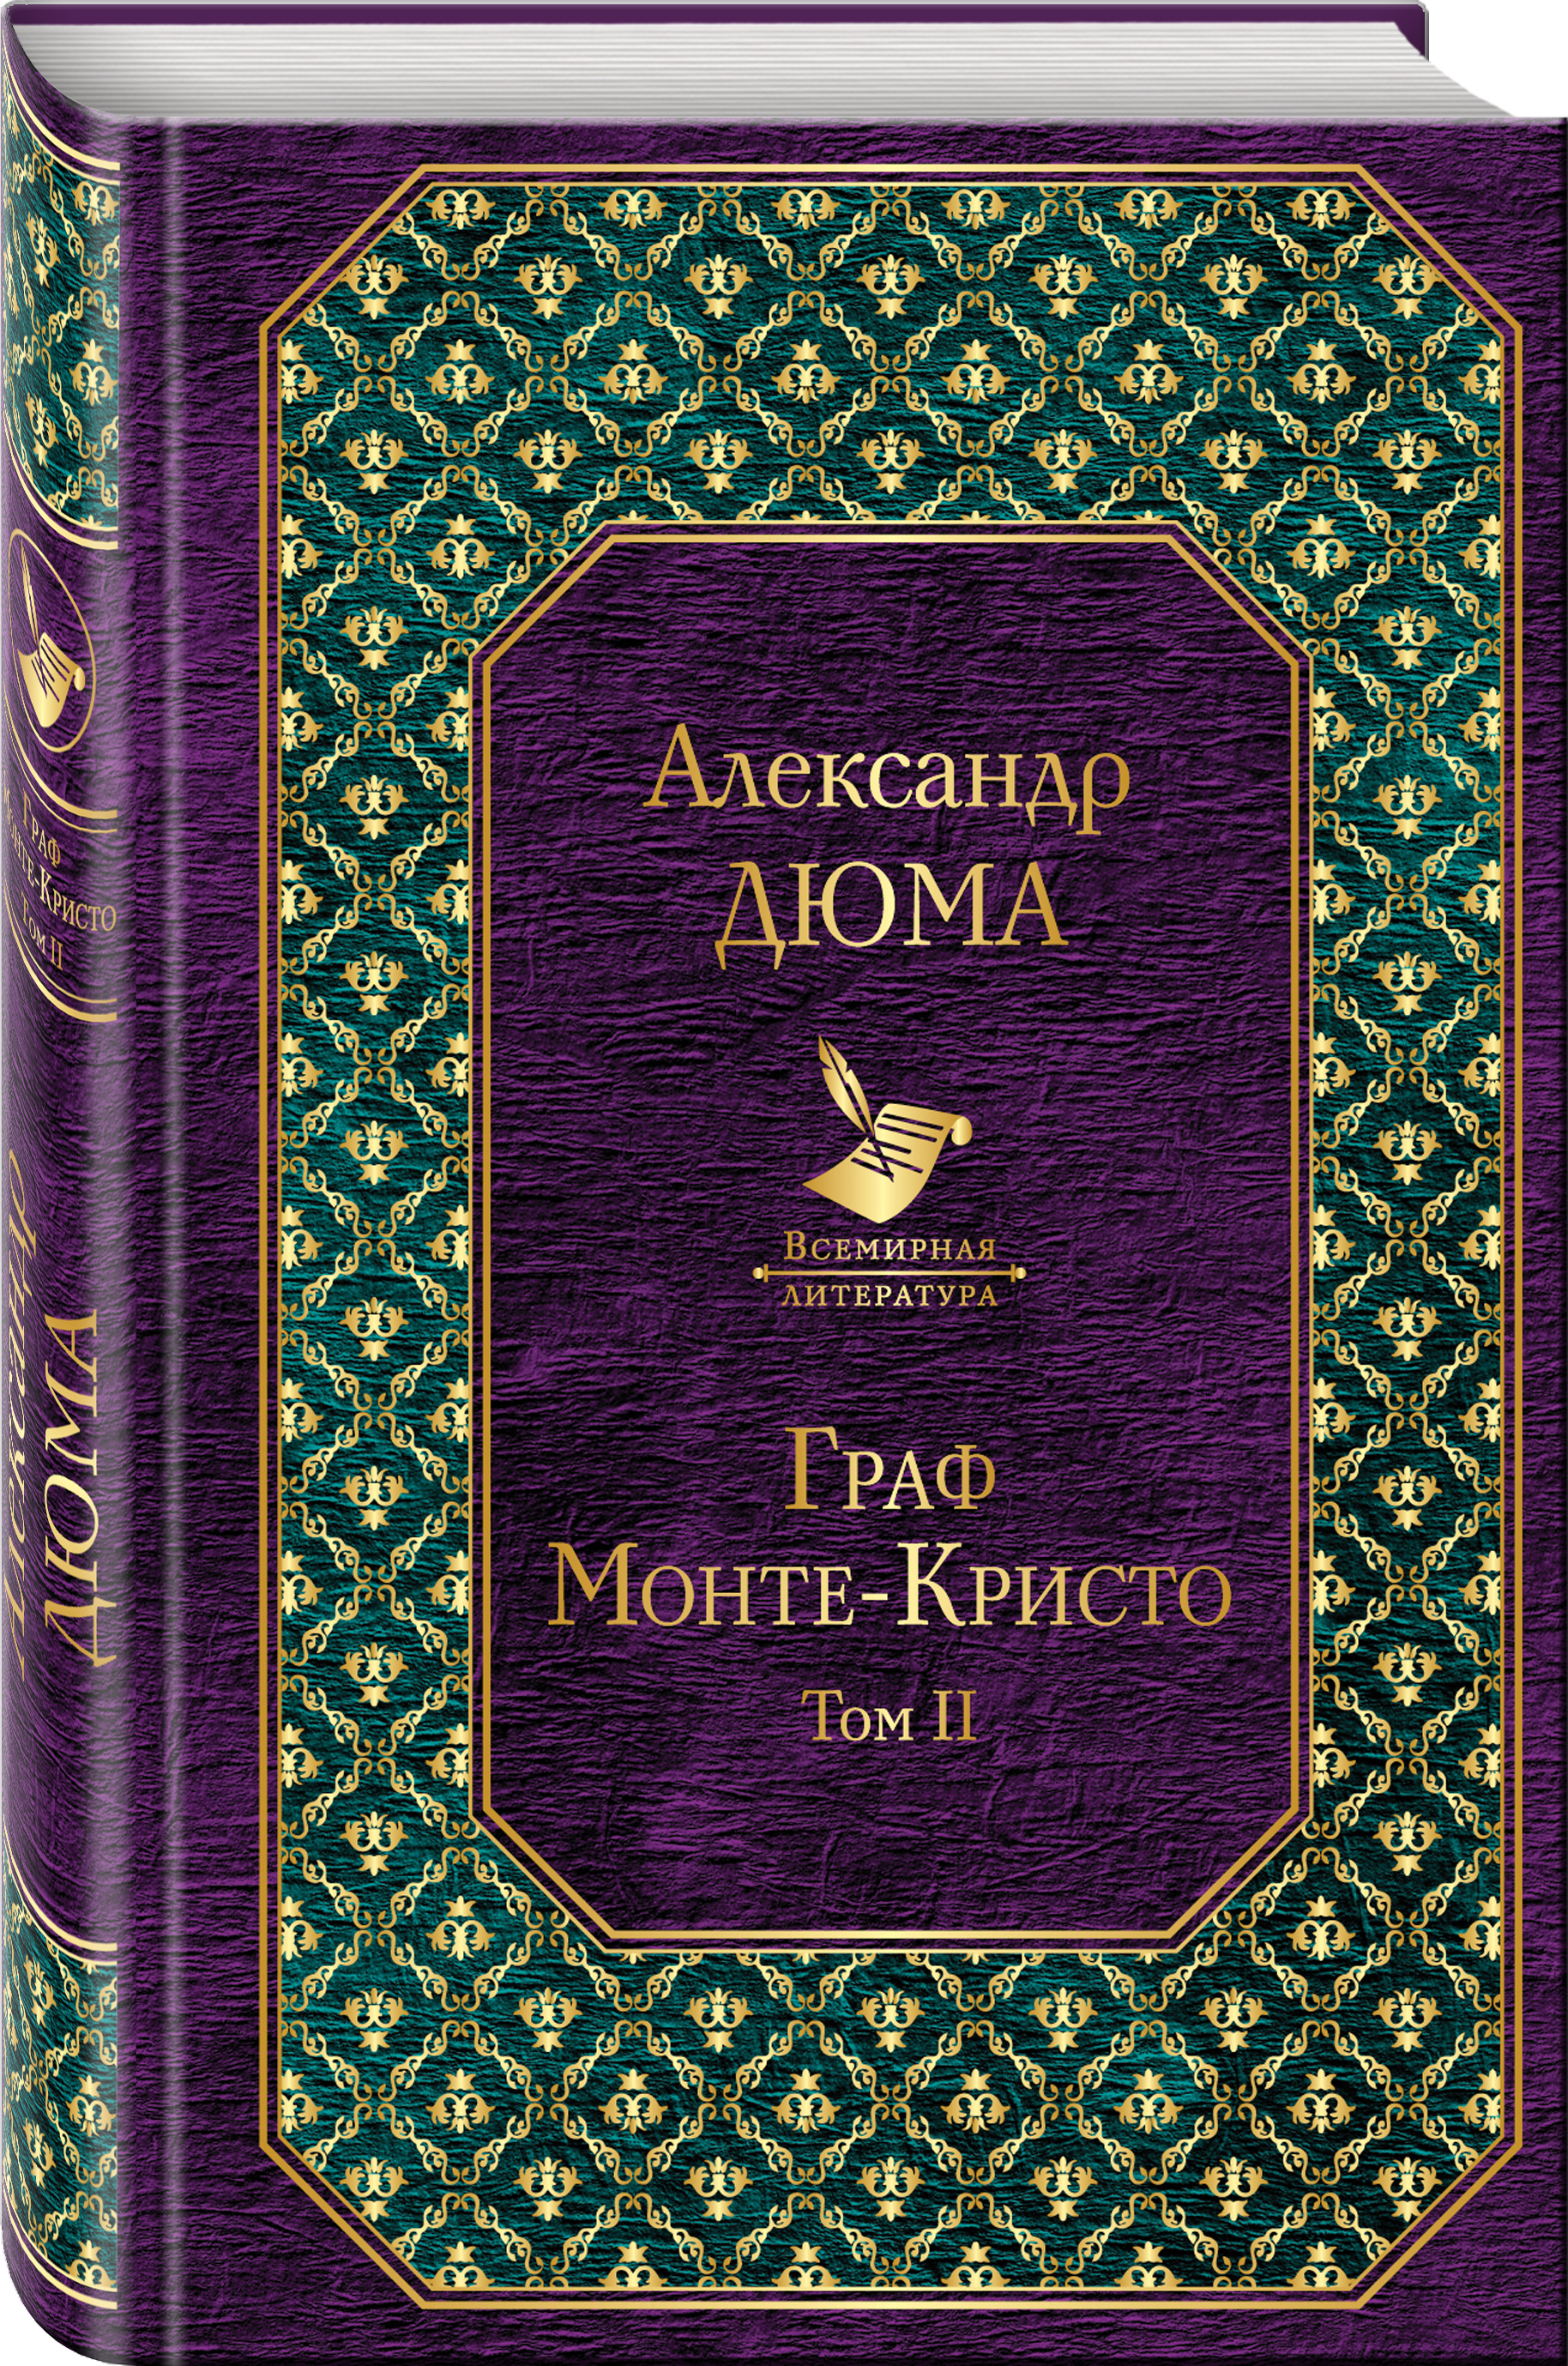 Дюма А. Граф Монте-Кристо. Т. 2 ISBN: 978-5-699-97102-2 александр дюма граф монте кристо том 2 isbn 978 5 699 34983 8